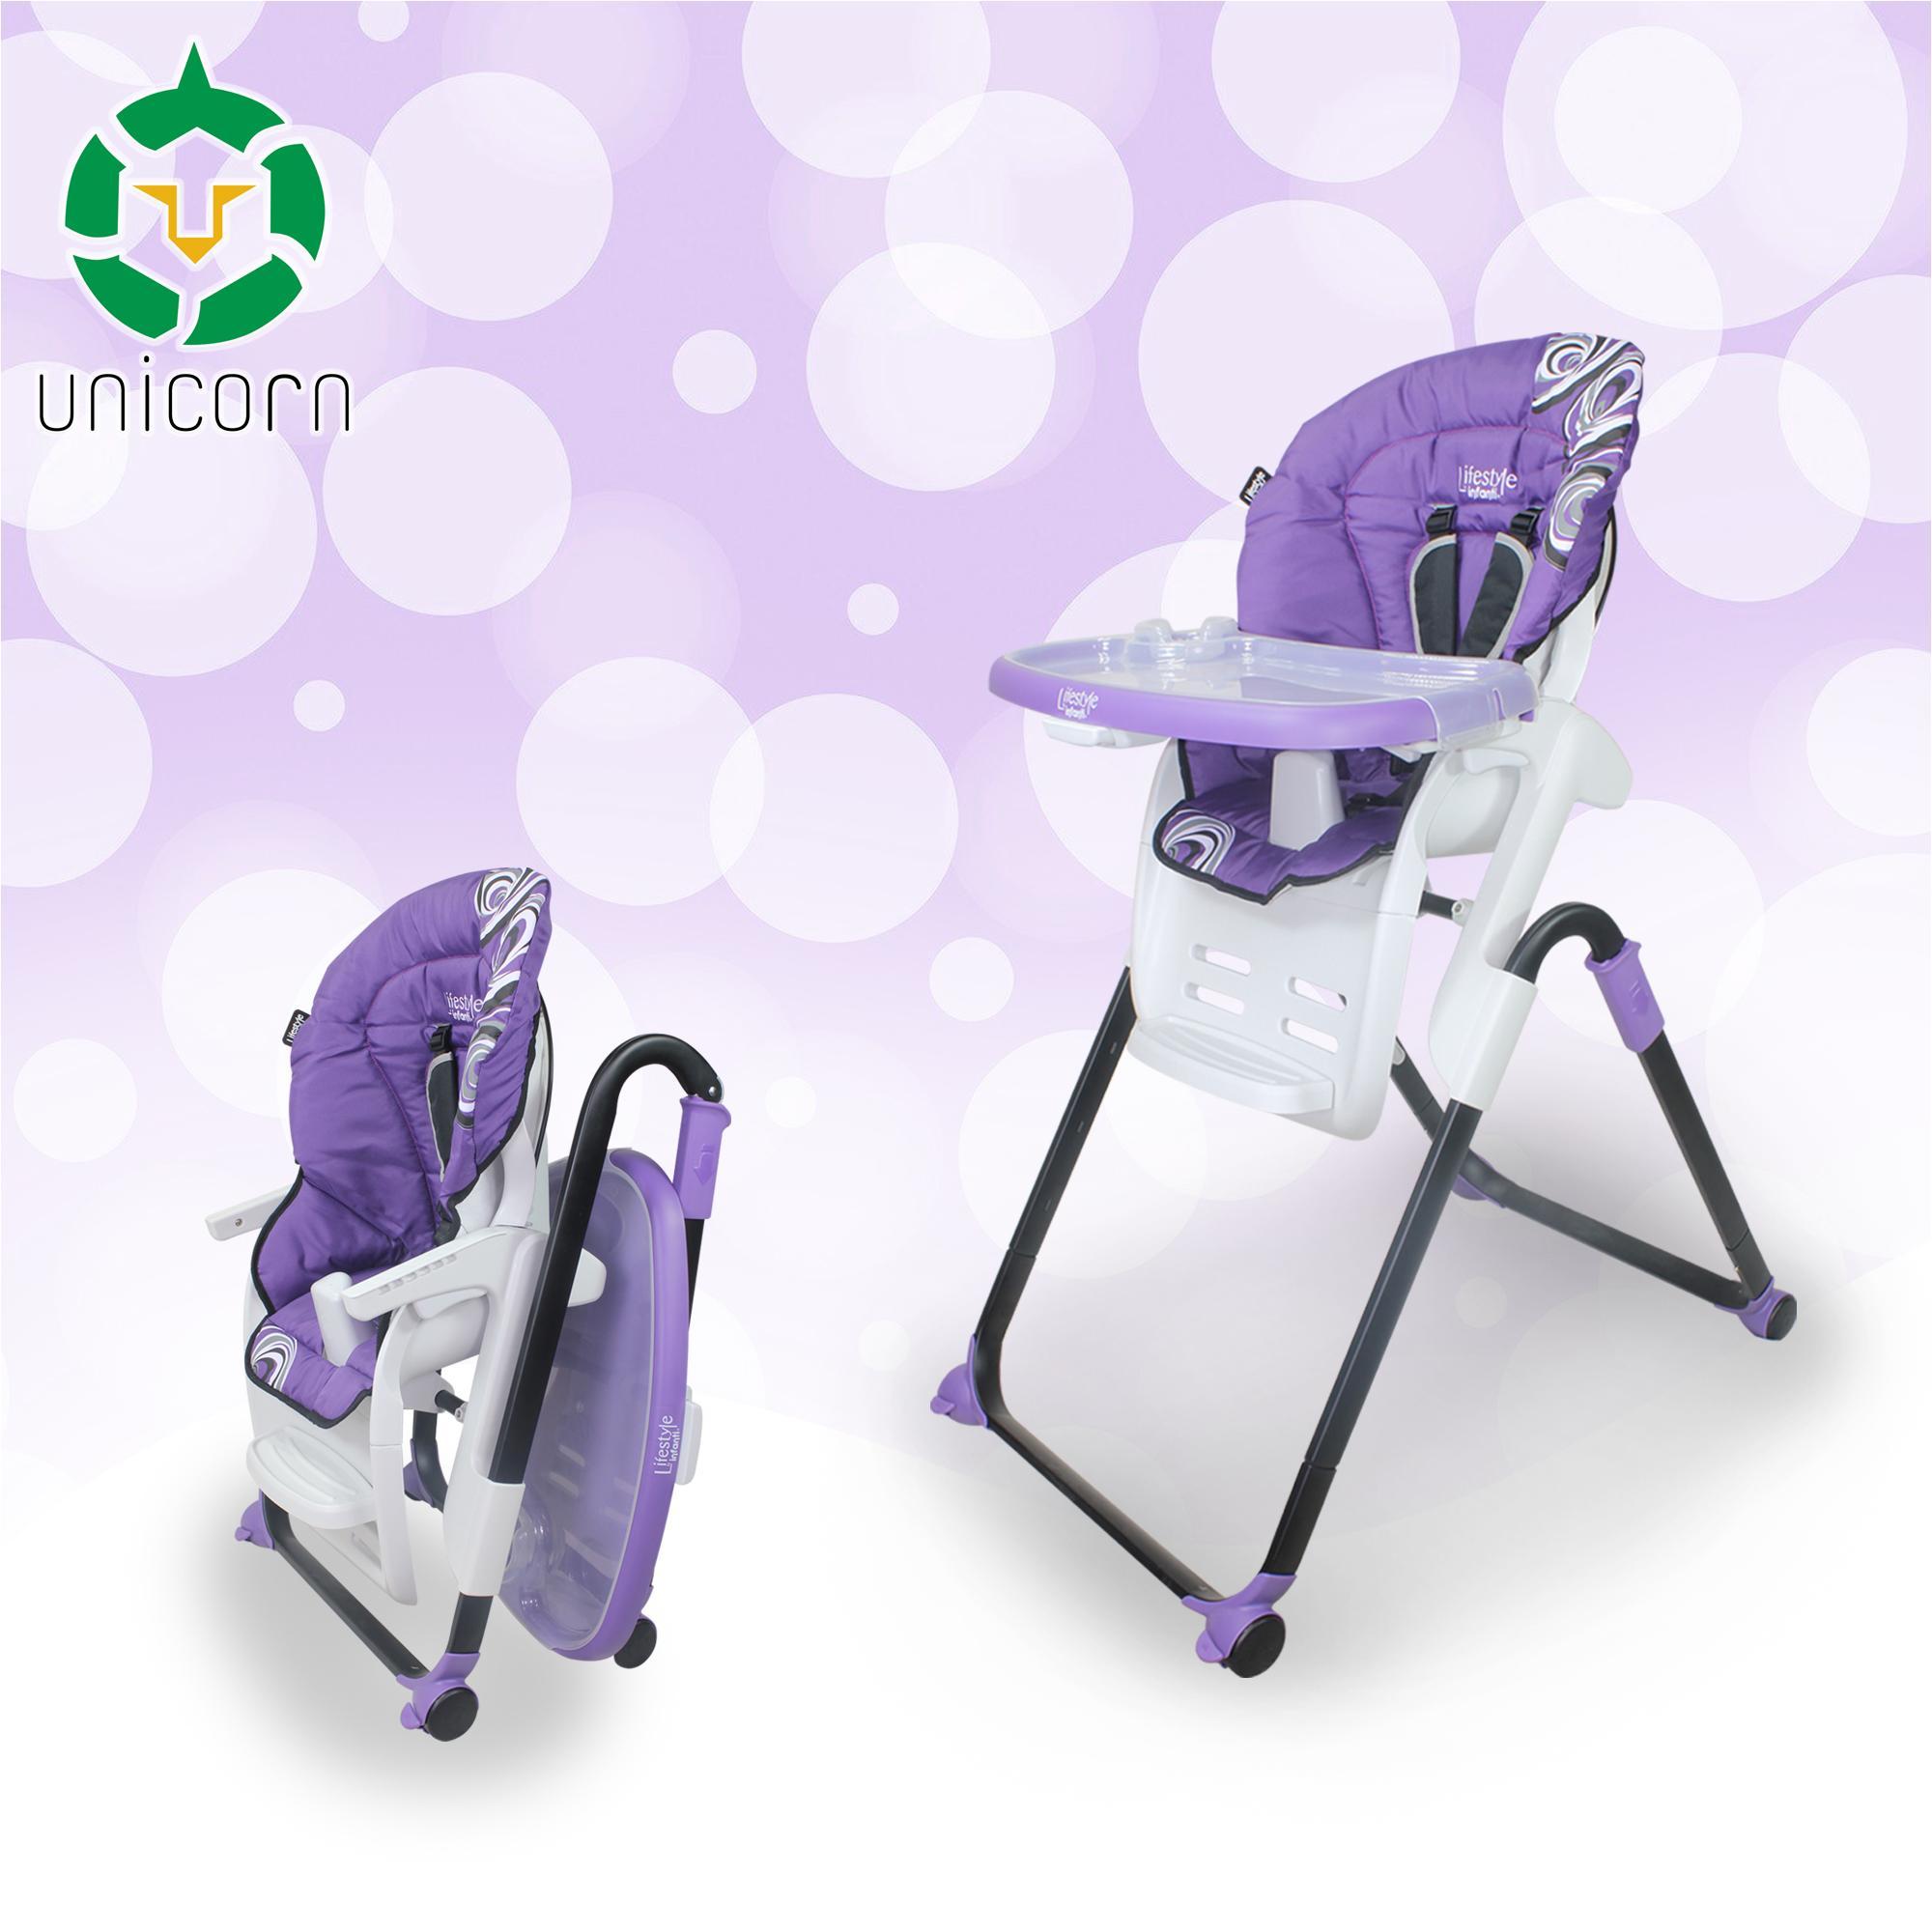 b370349c UnicornSelected Philippines - UnicornSelected Highchairs for sale ...